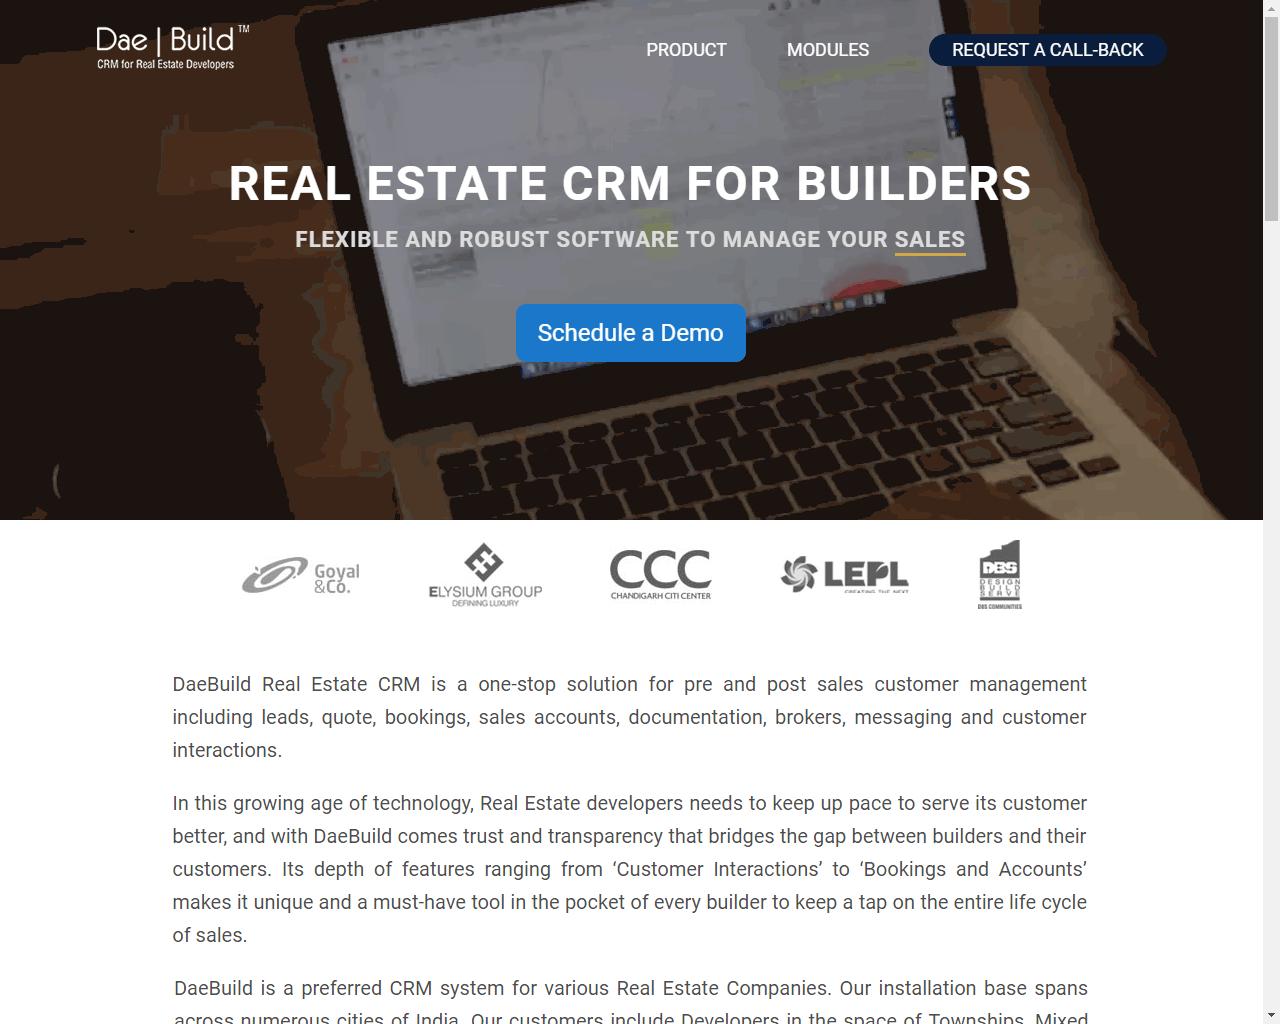 DaeBuild Real Estate CRM Software